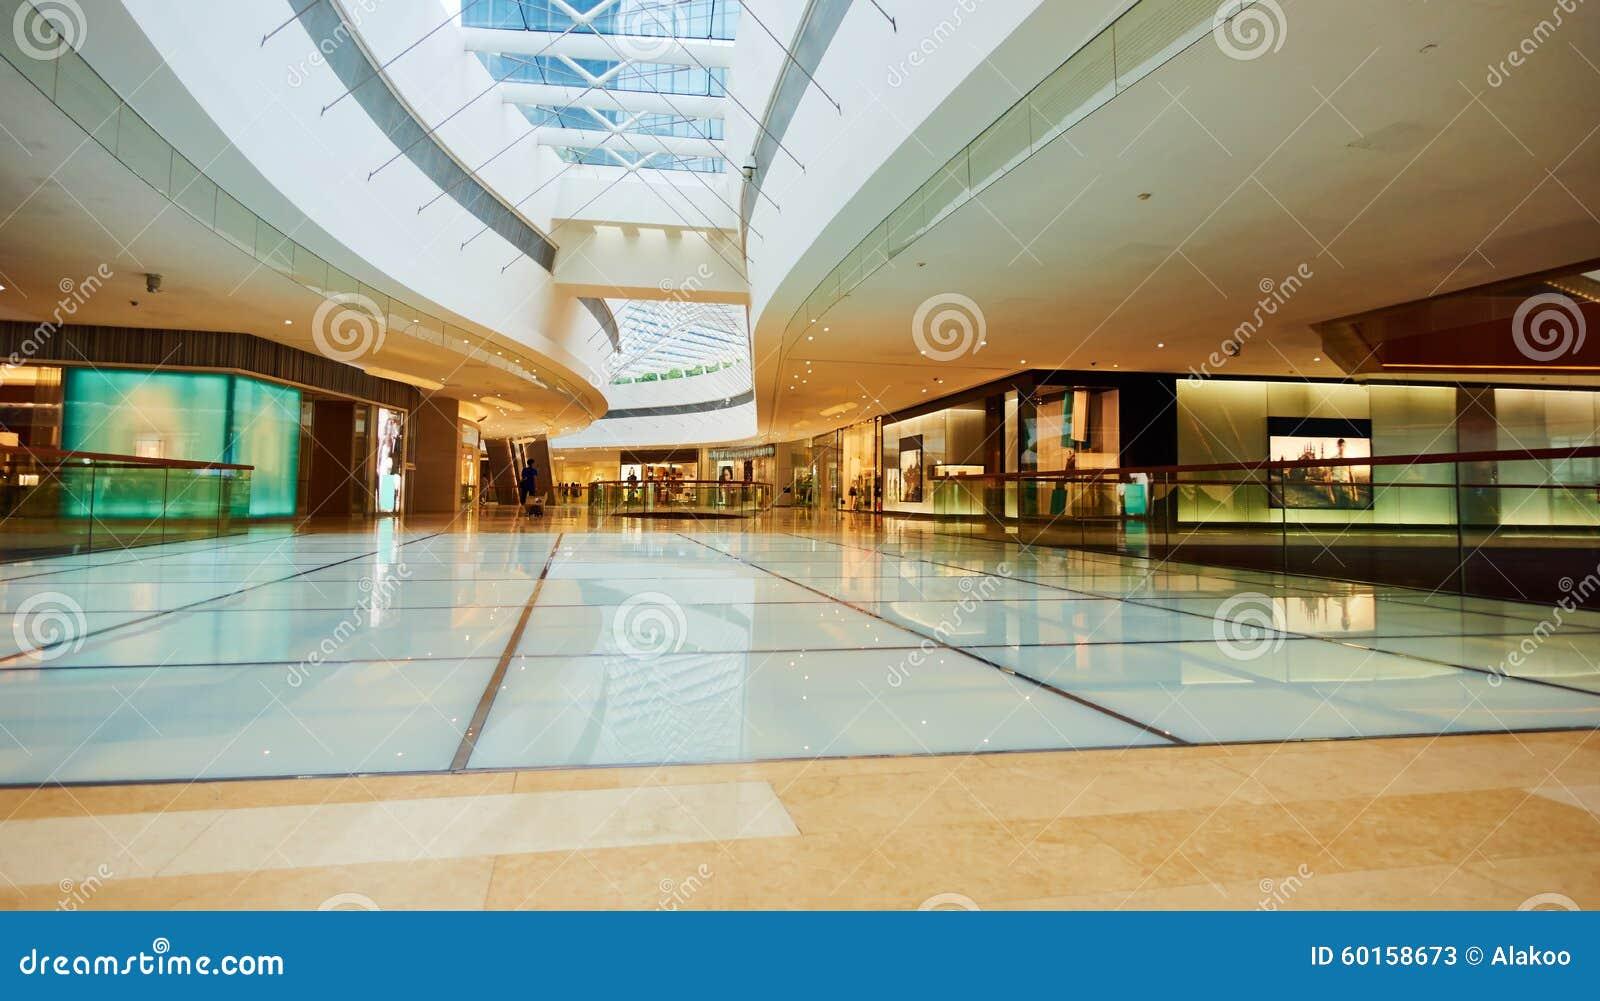 Foyer Hallway Store : Shopping mall stock image of corridor indoor